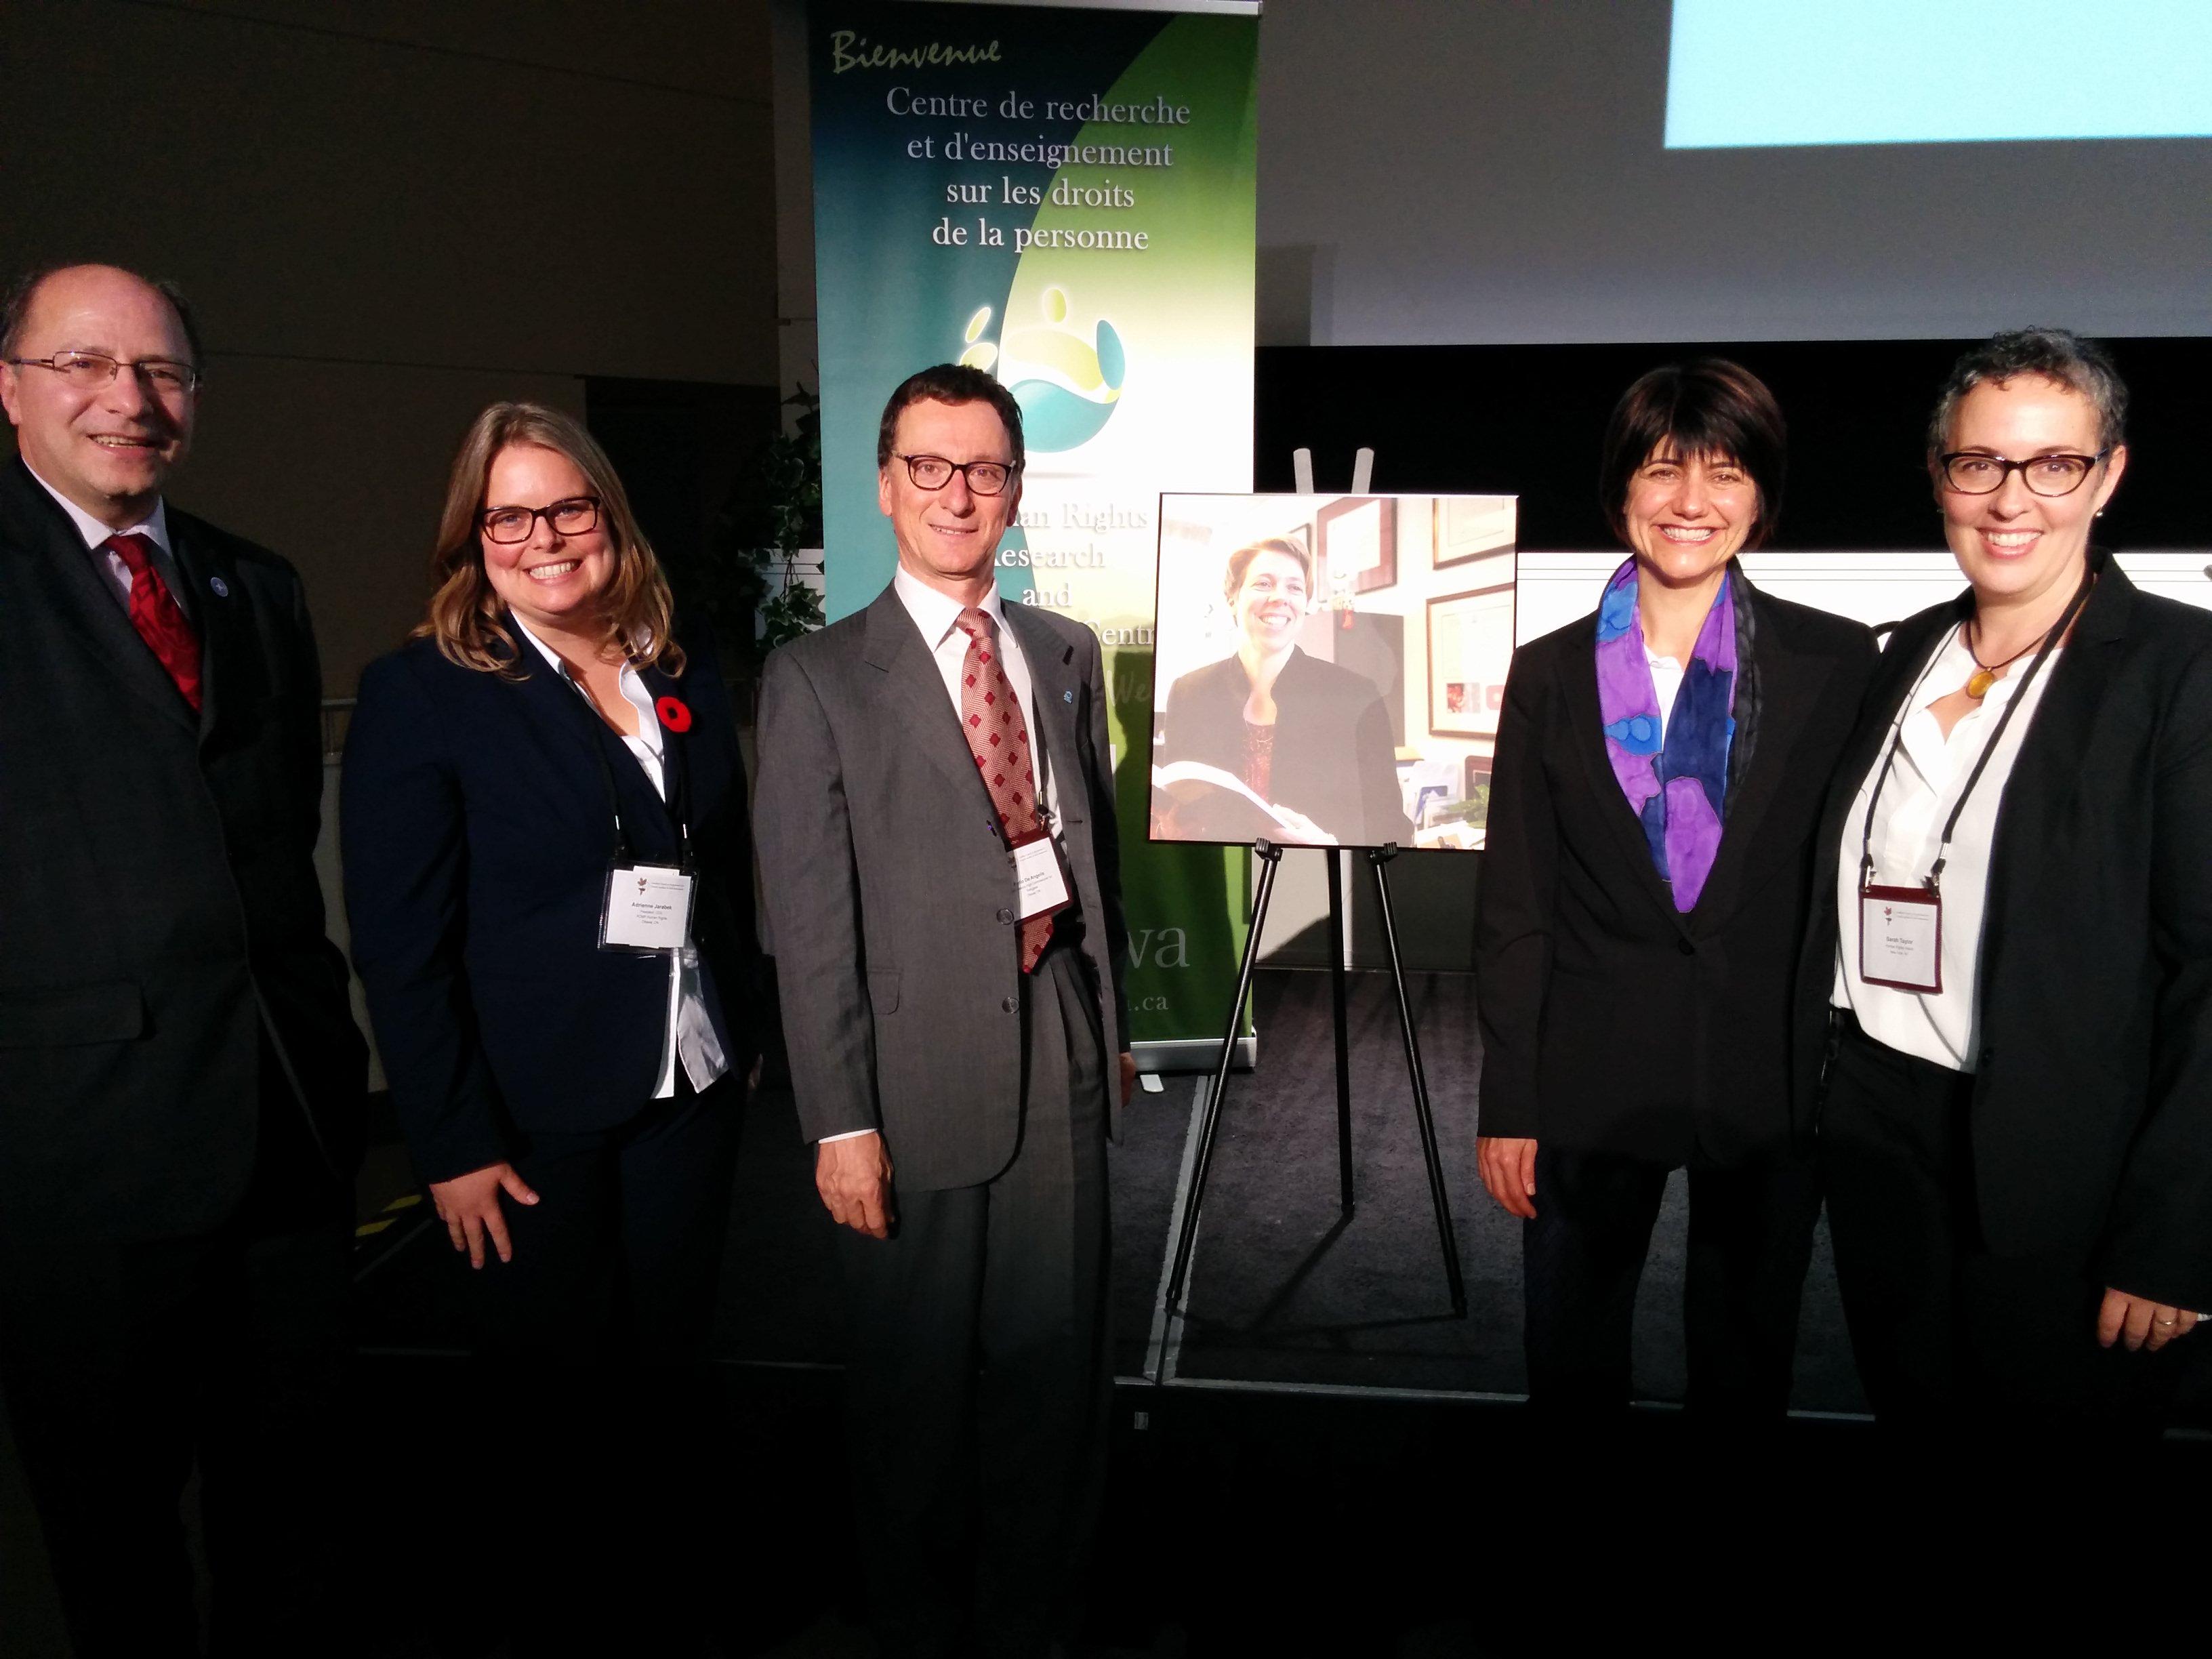 John Packer, Adrienne Jarabek Marion (President, Canadian Council on International Law 2015) and panelists Firo De Angelis (UNHCR), Nathalie Ricard (uLaval), Sarah Taylor (HRW)